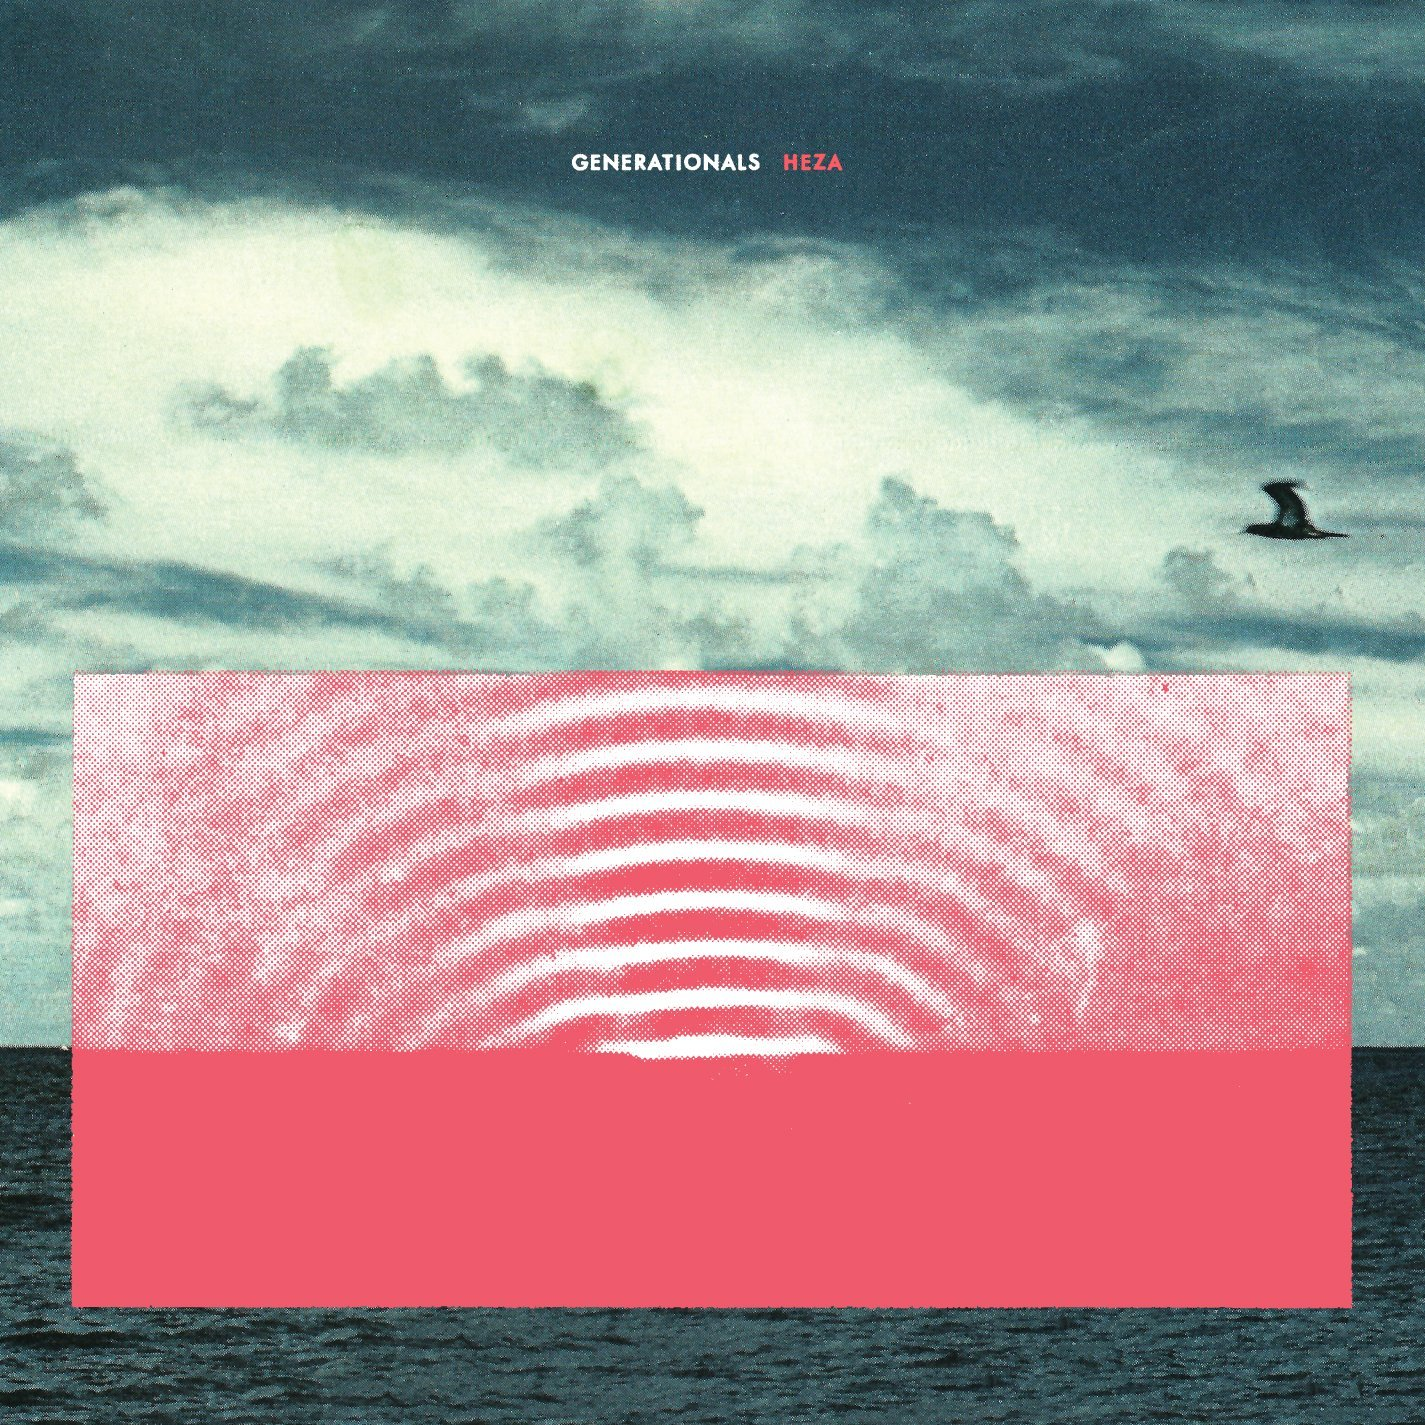 generationals-heza-album-art